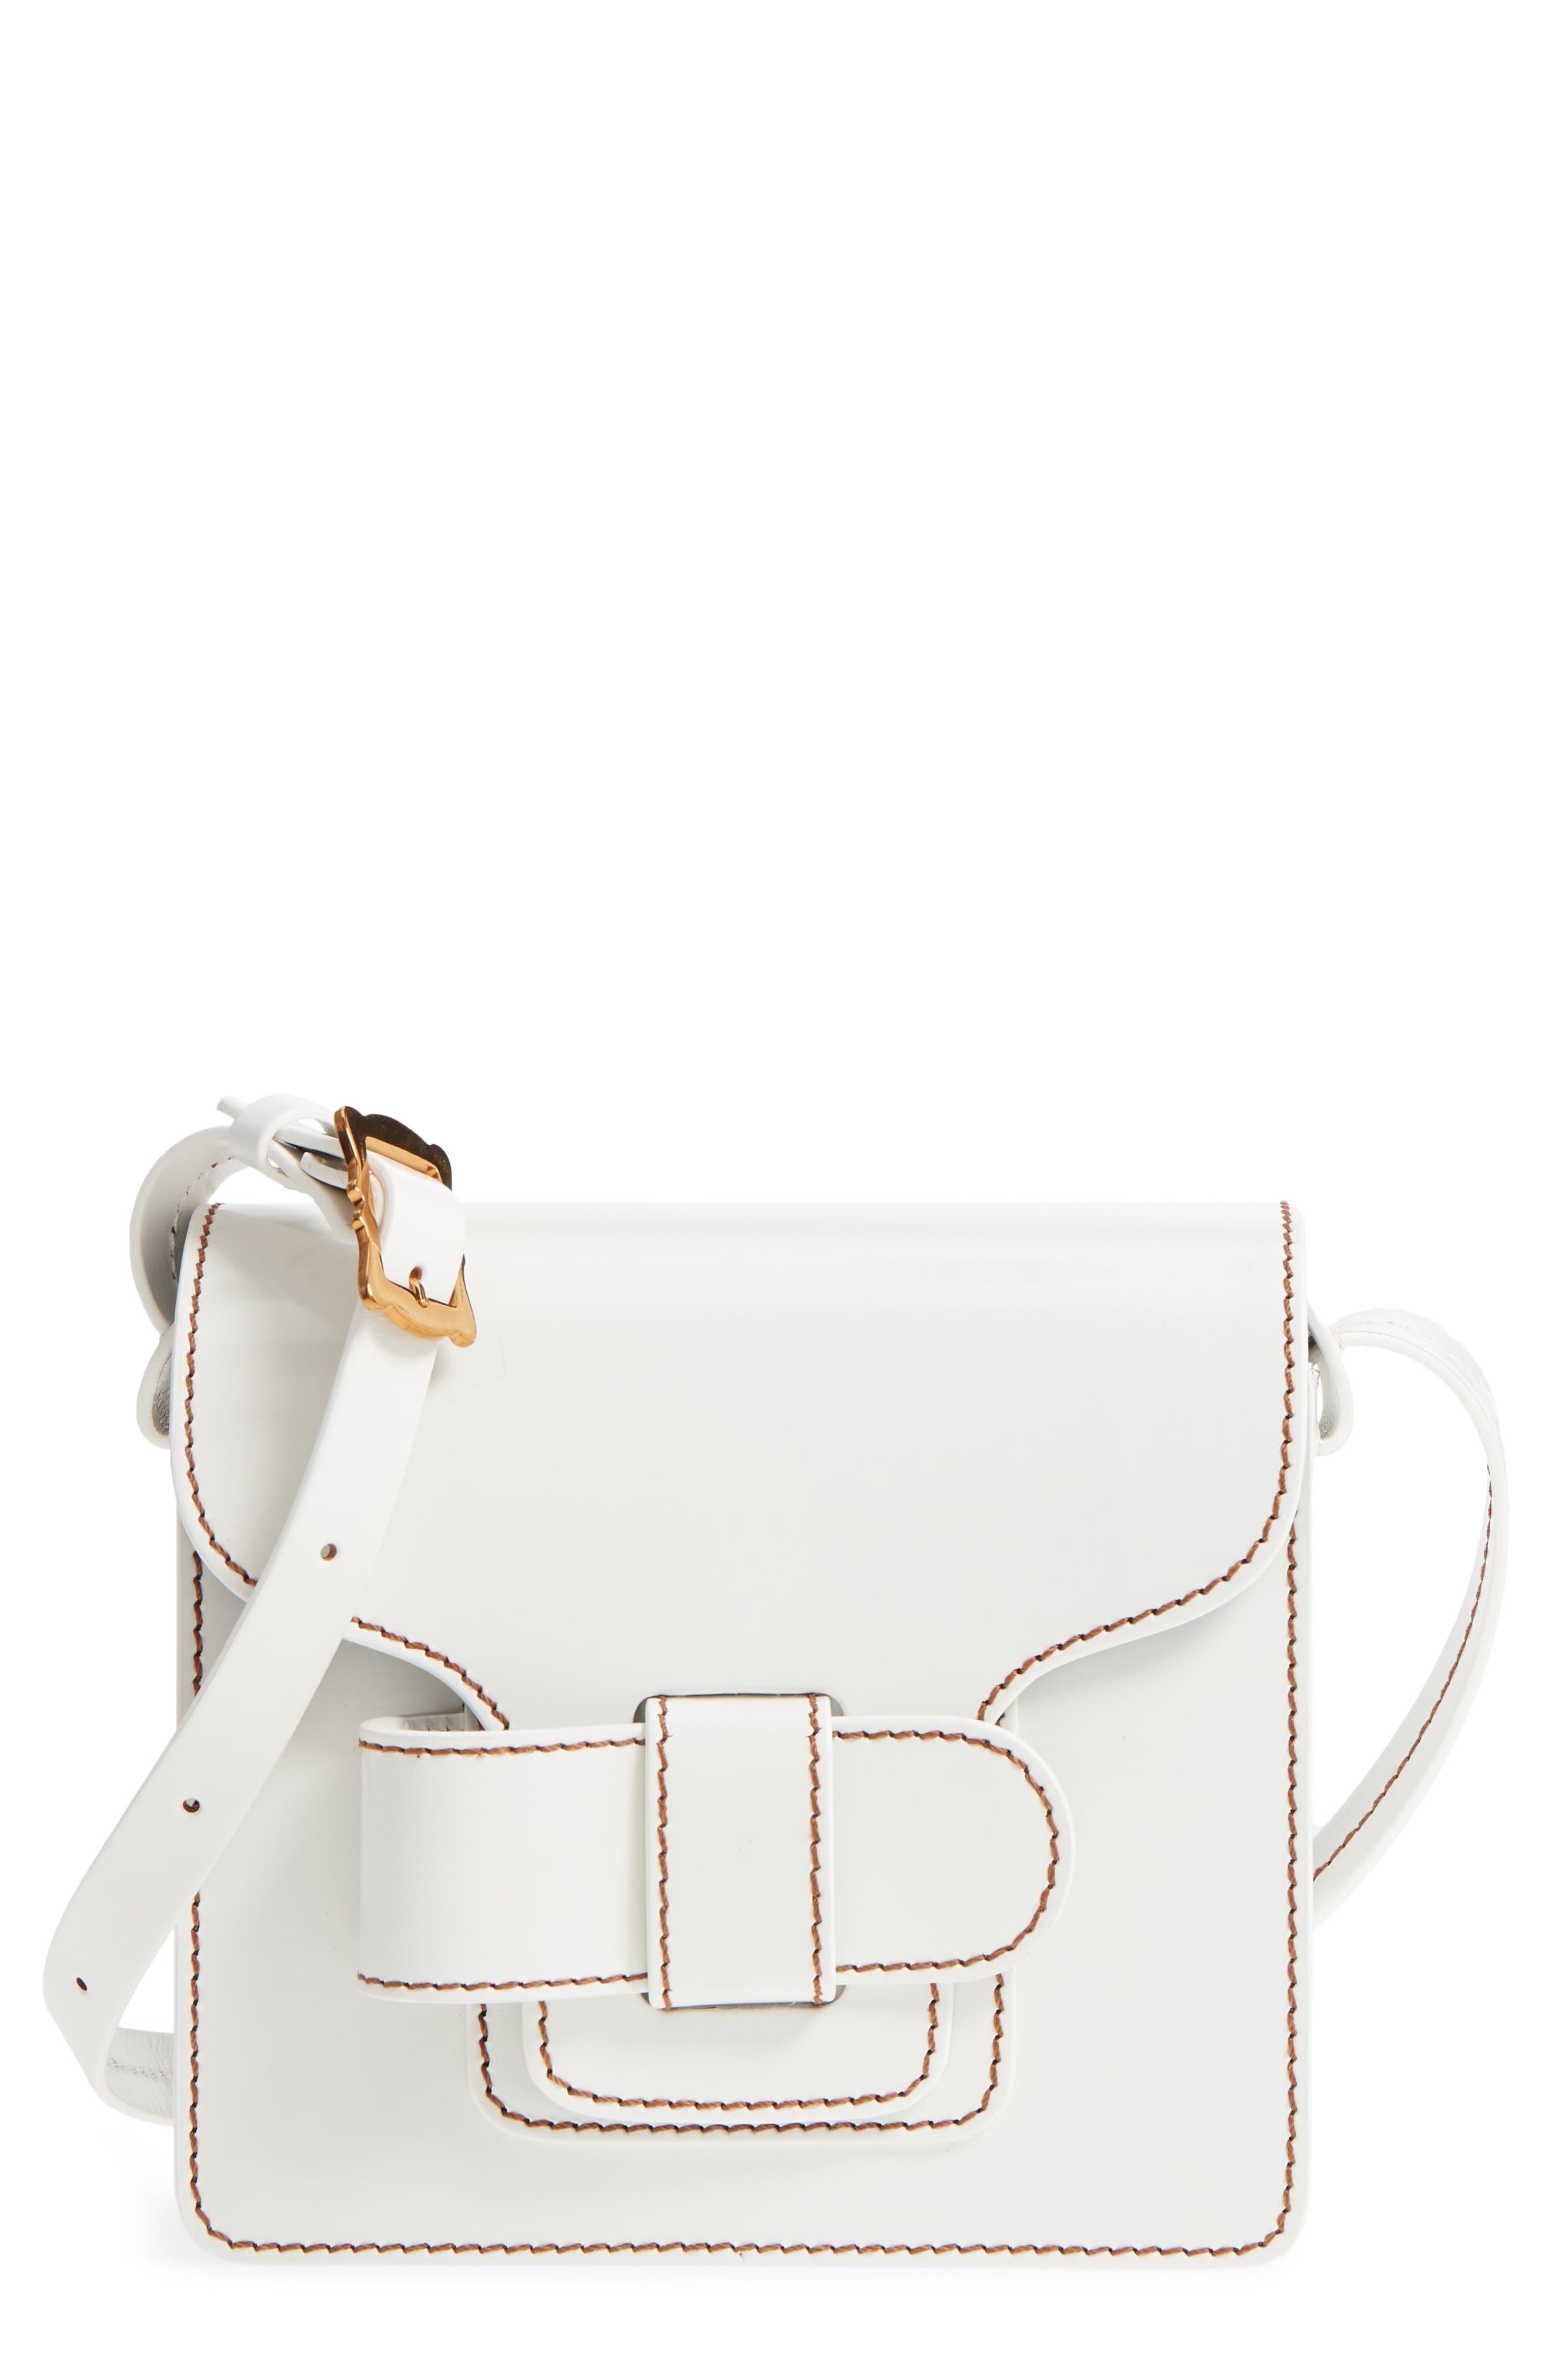 Greta Leather Crossbody Bag,                             Main thumbnail 1, color,                             White